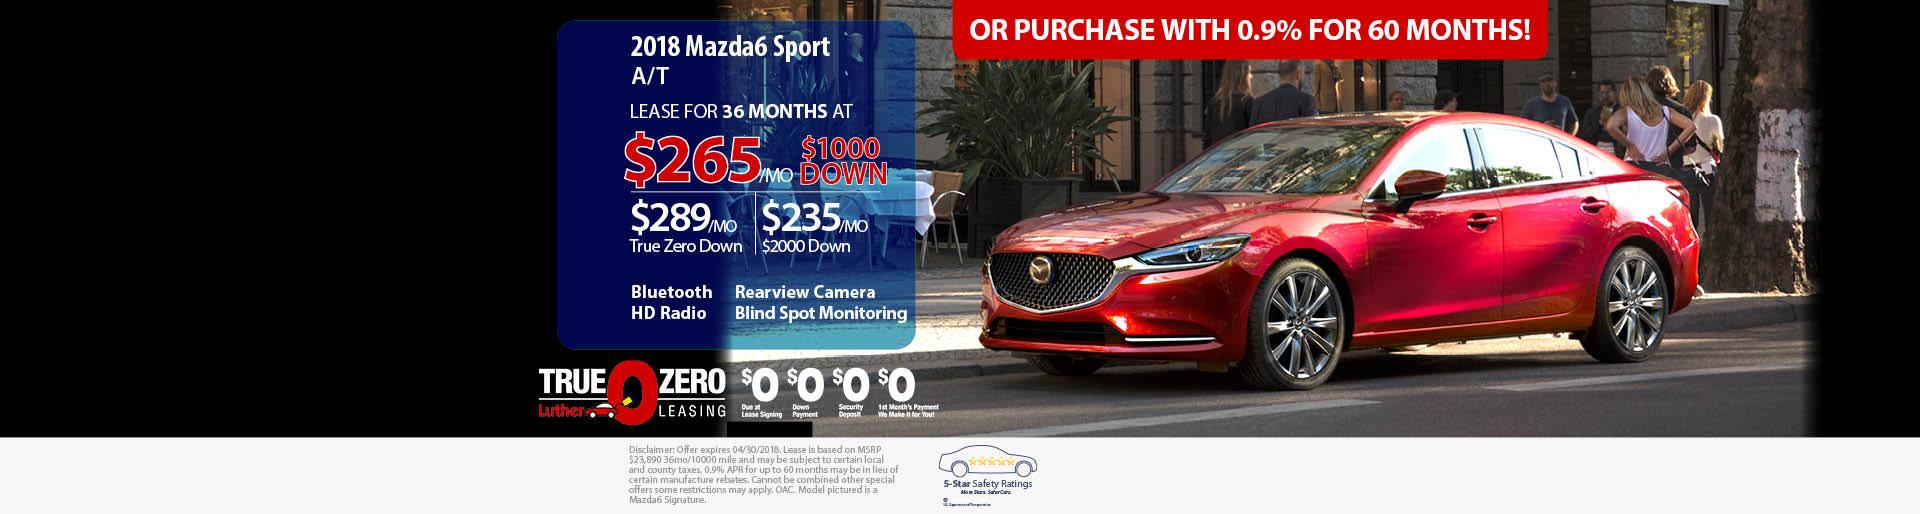 Luther Mazda New Mazda Dealership In Brooklyn Center Mn